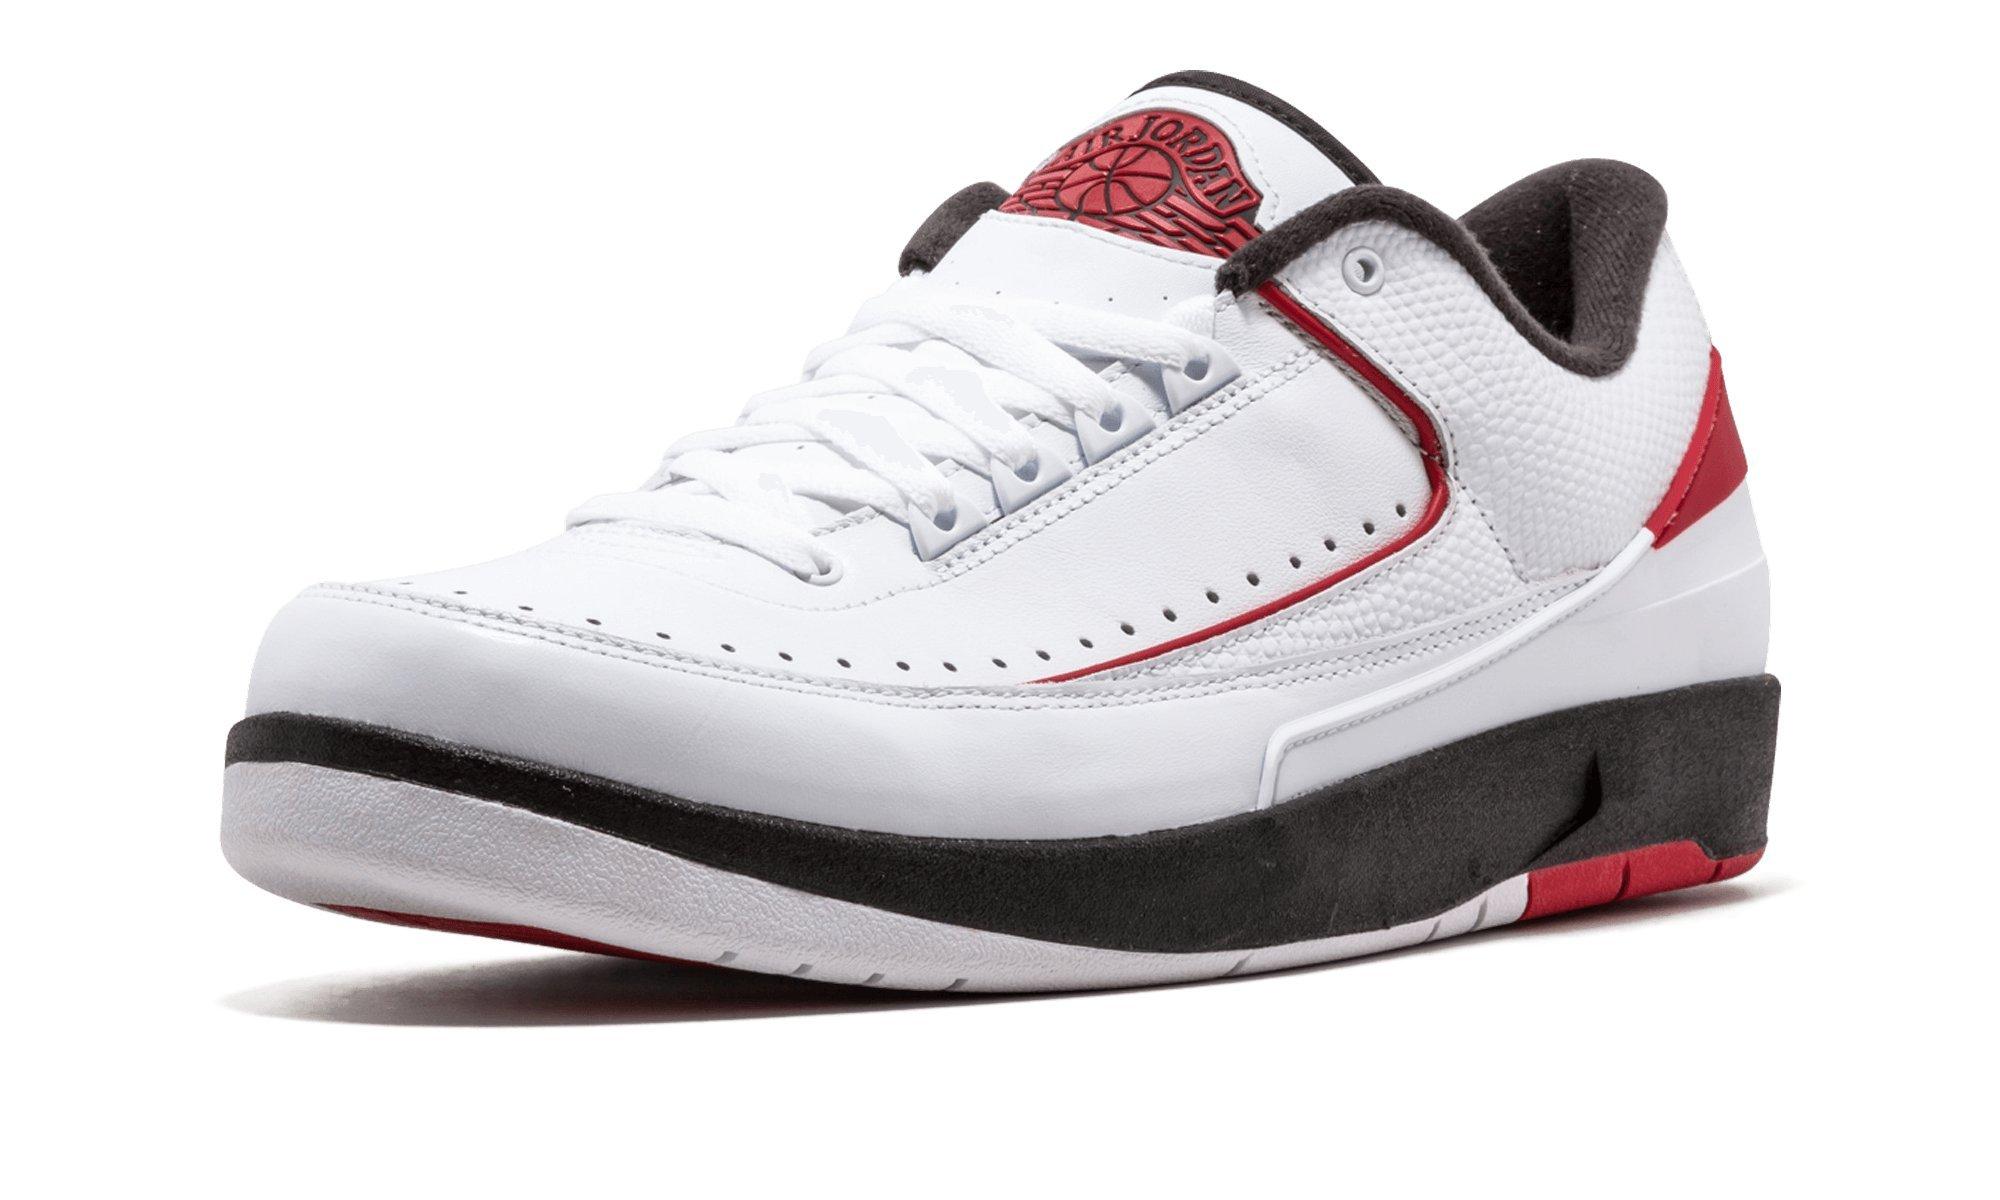 lowest price get new latest Air Jordan 2 Retro Low - 832819 101